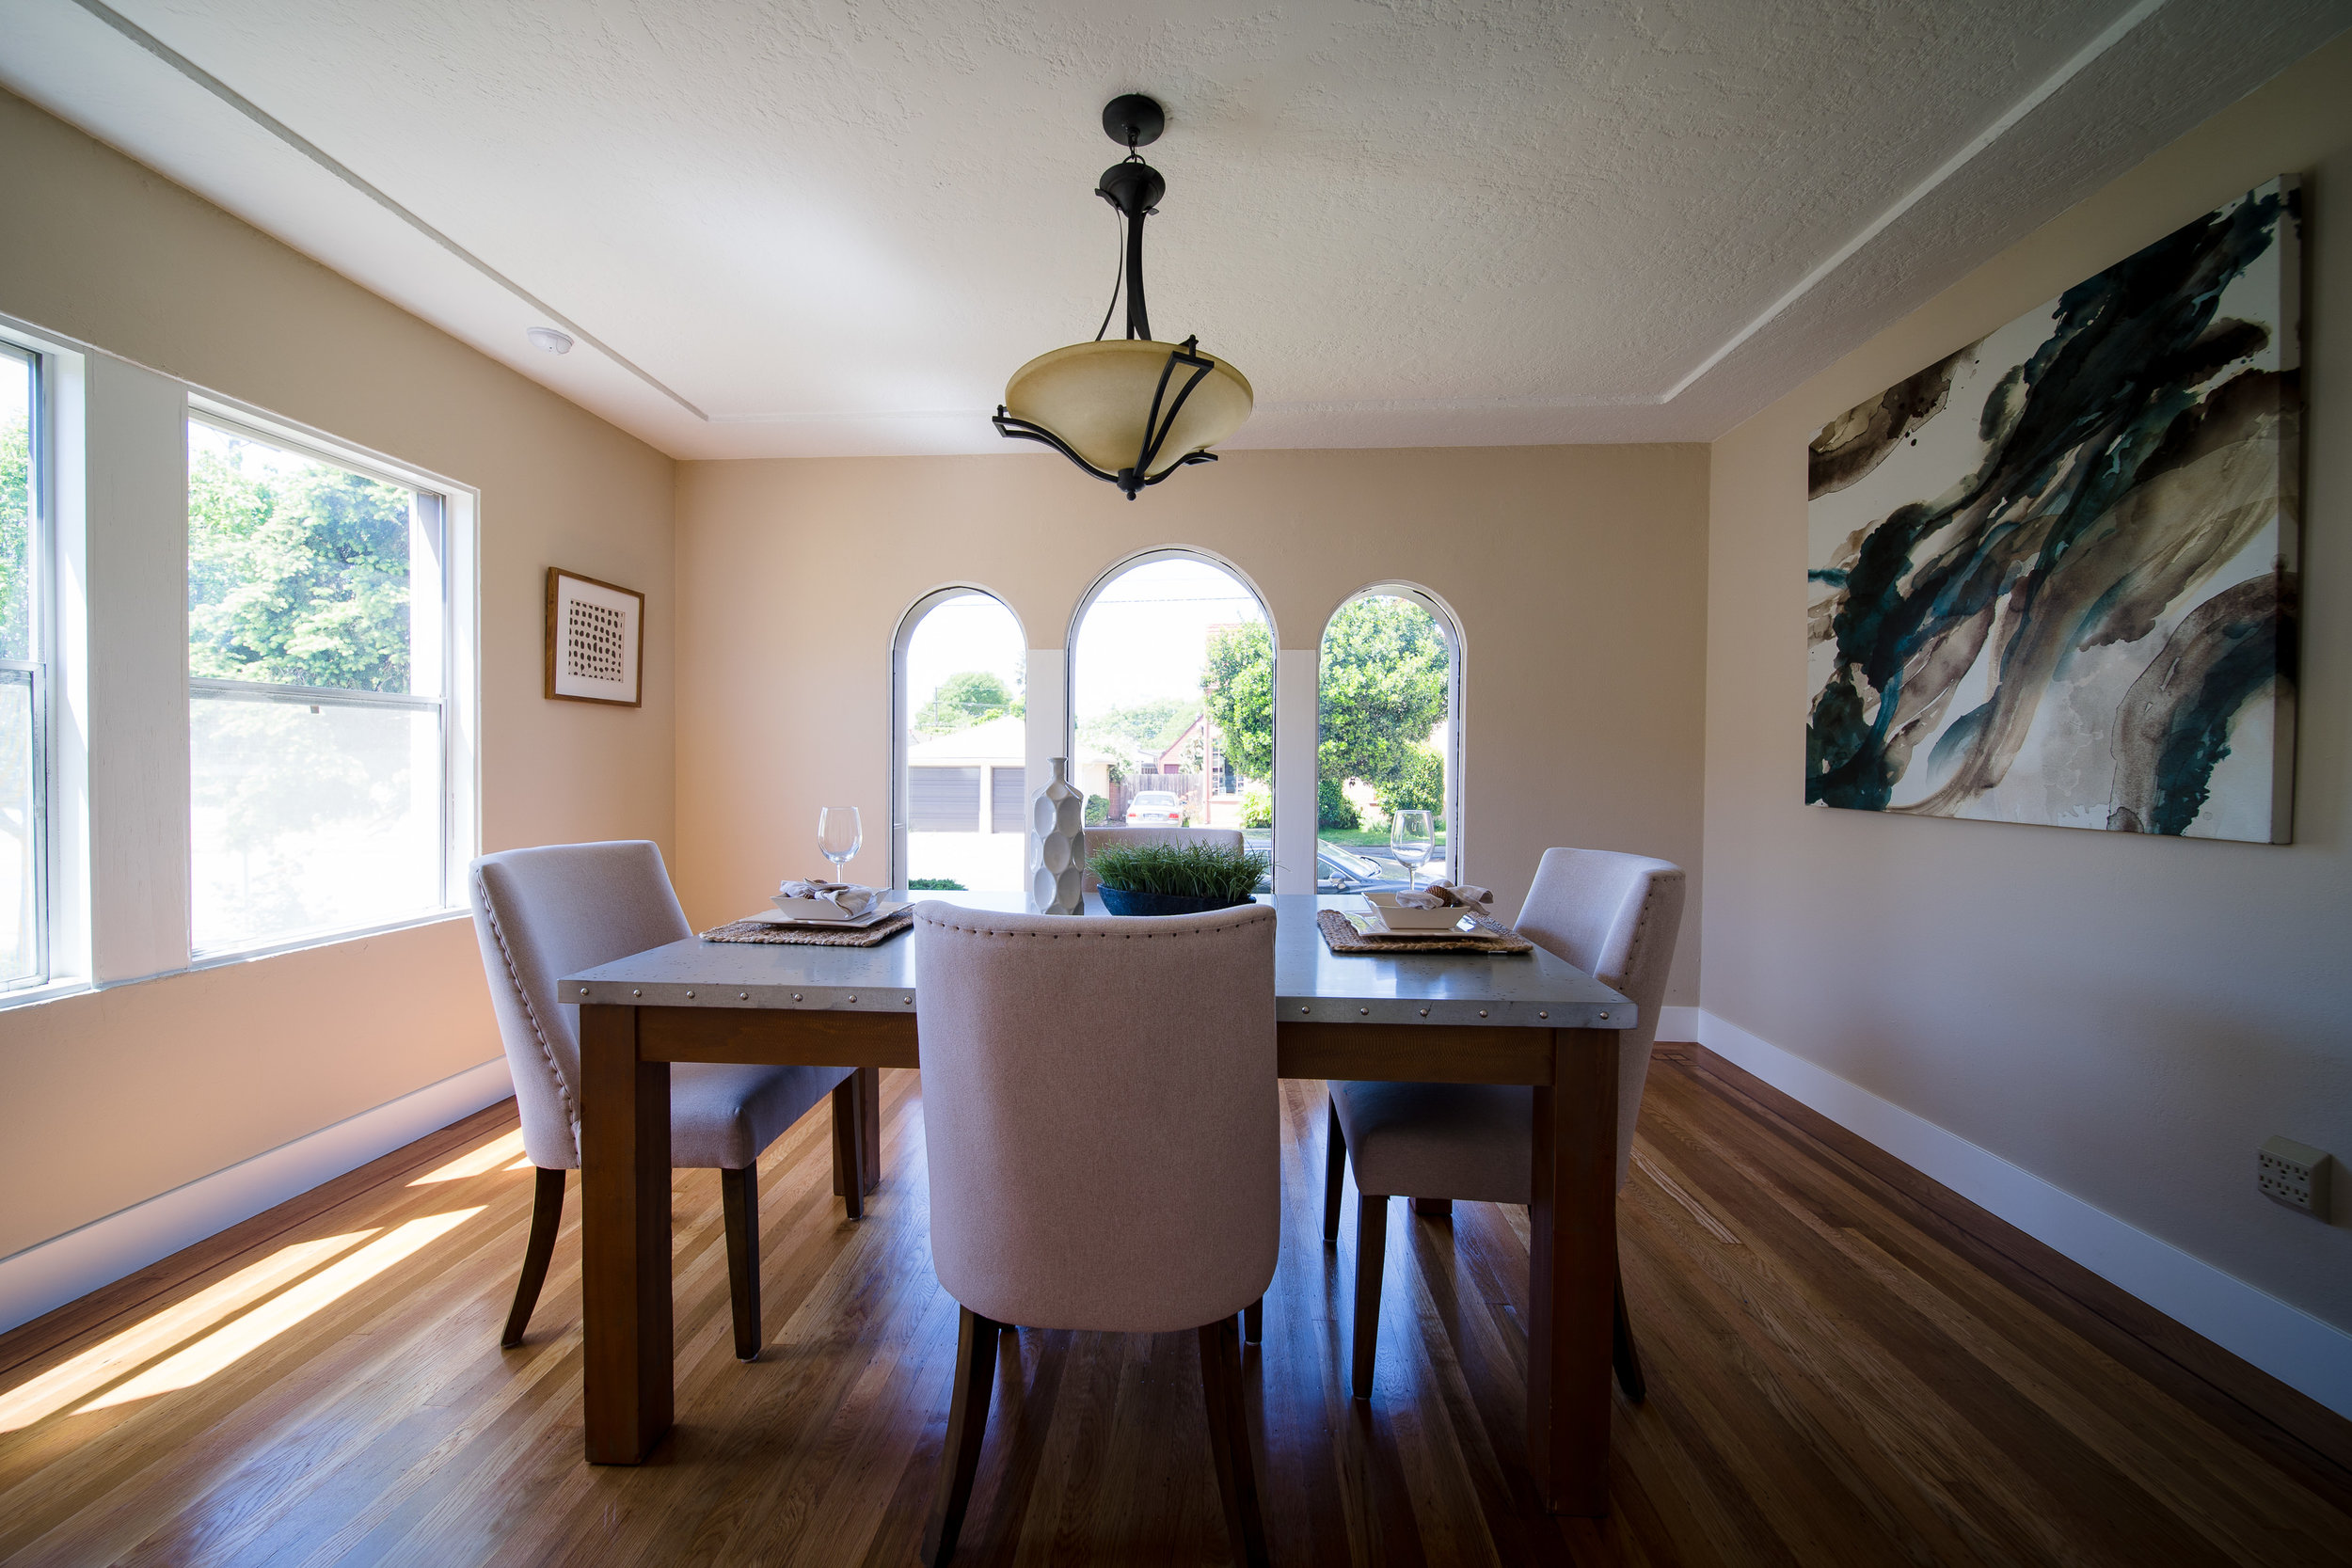 Sequoia Ricardo House-01375.jpg